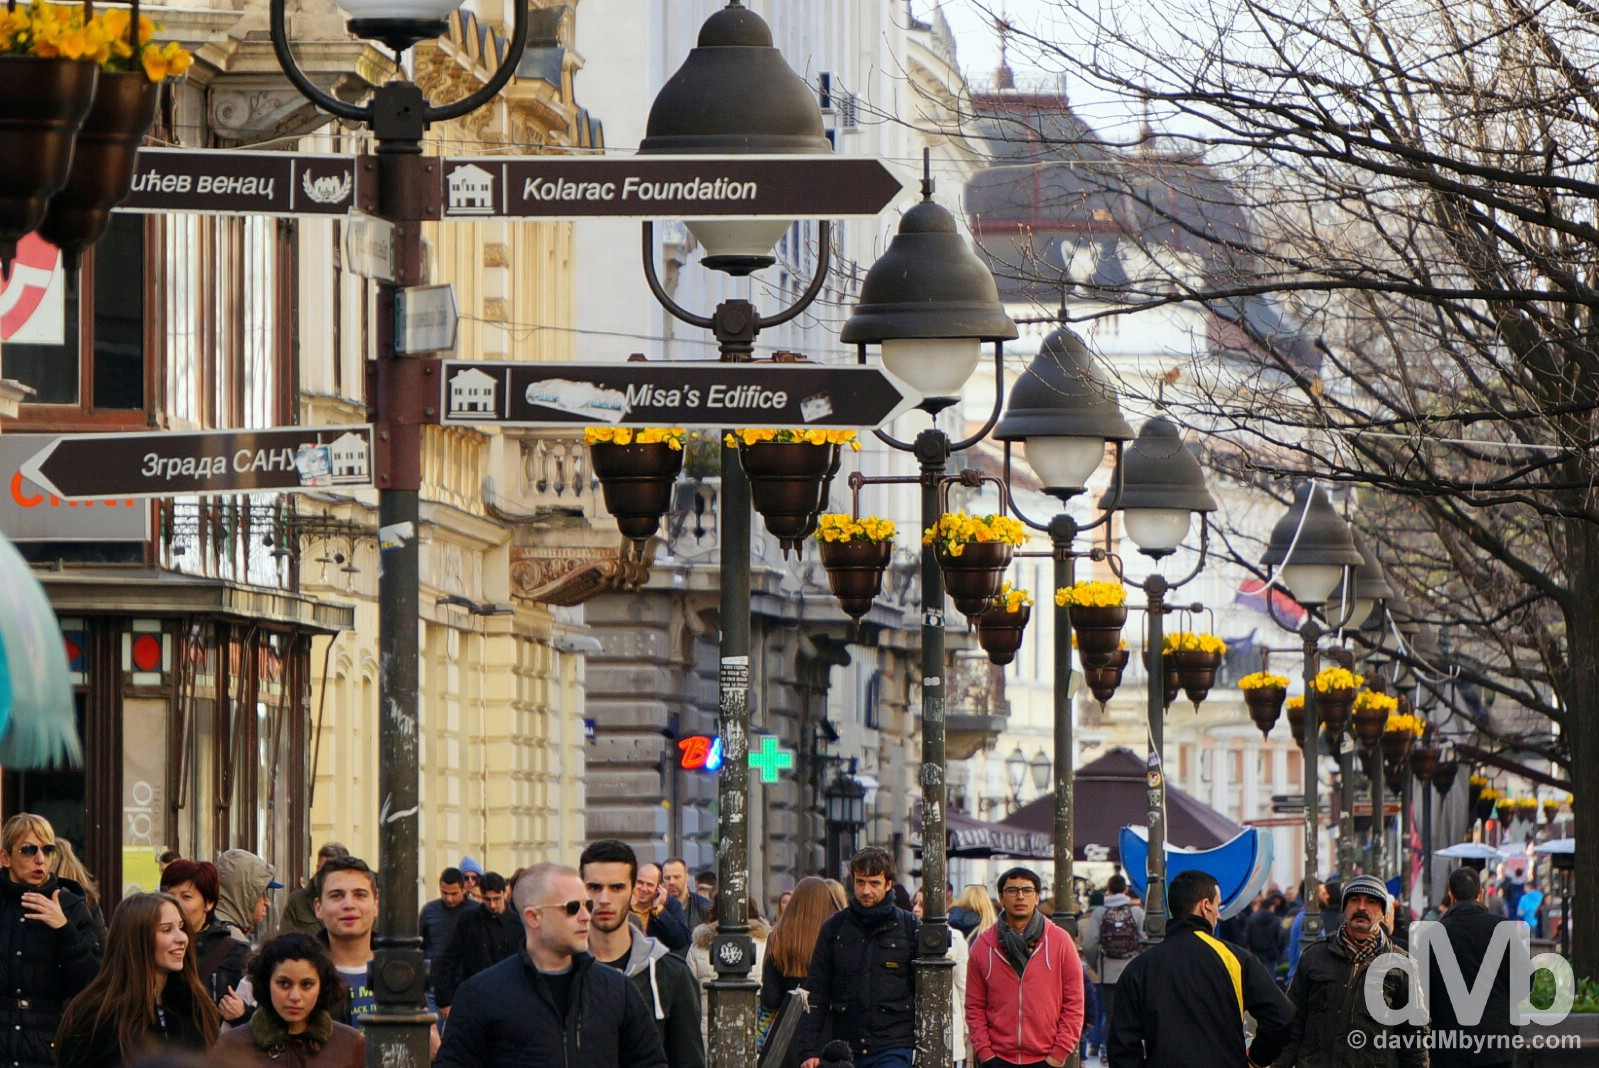 Knez Mihailova, Belgrade, Serbia. April 3, 2015.